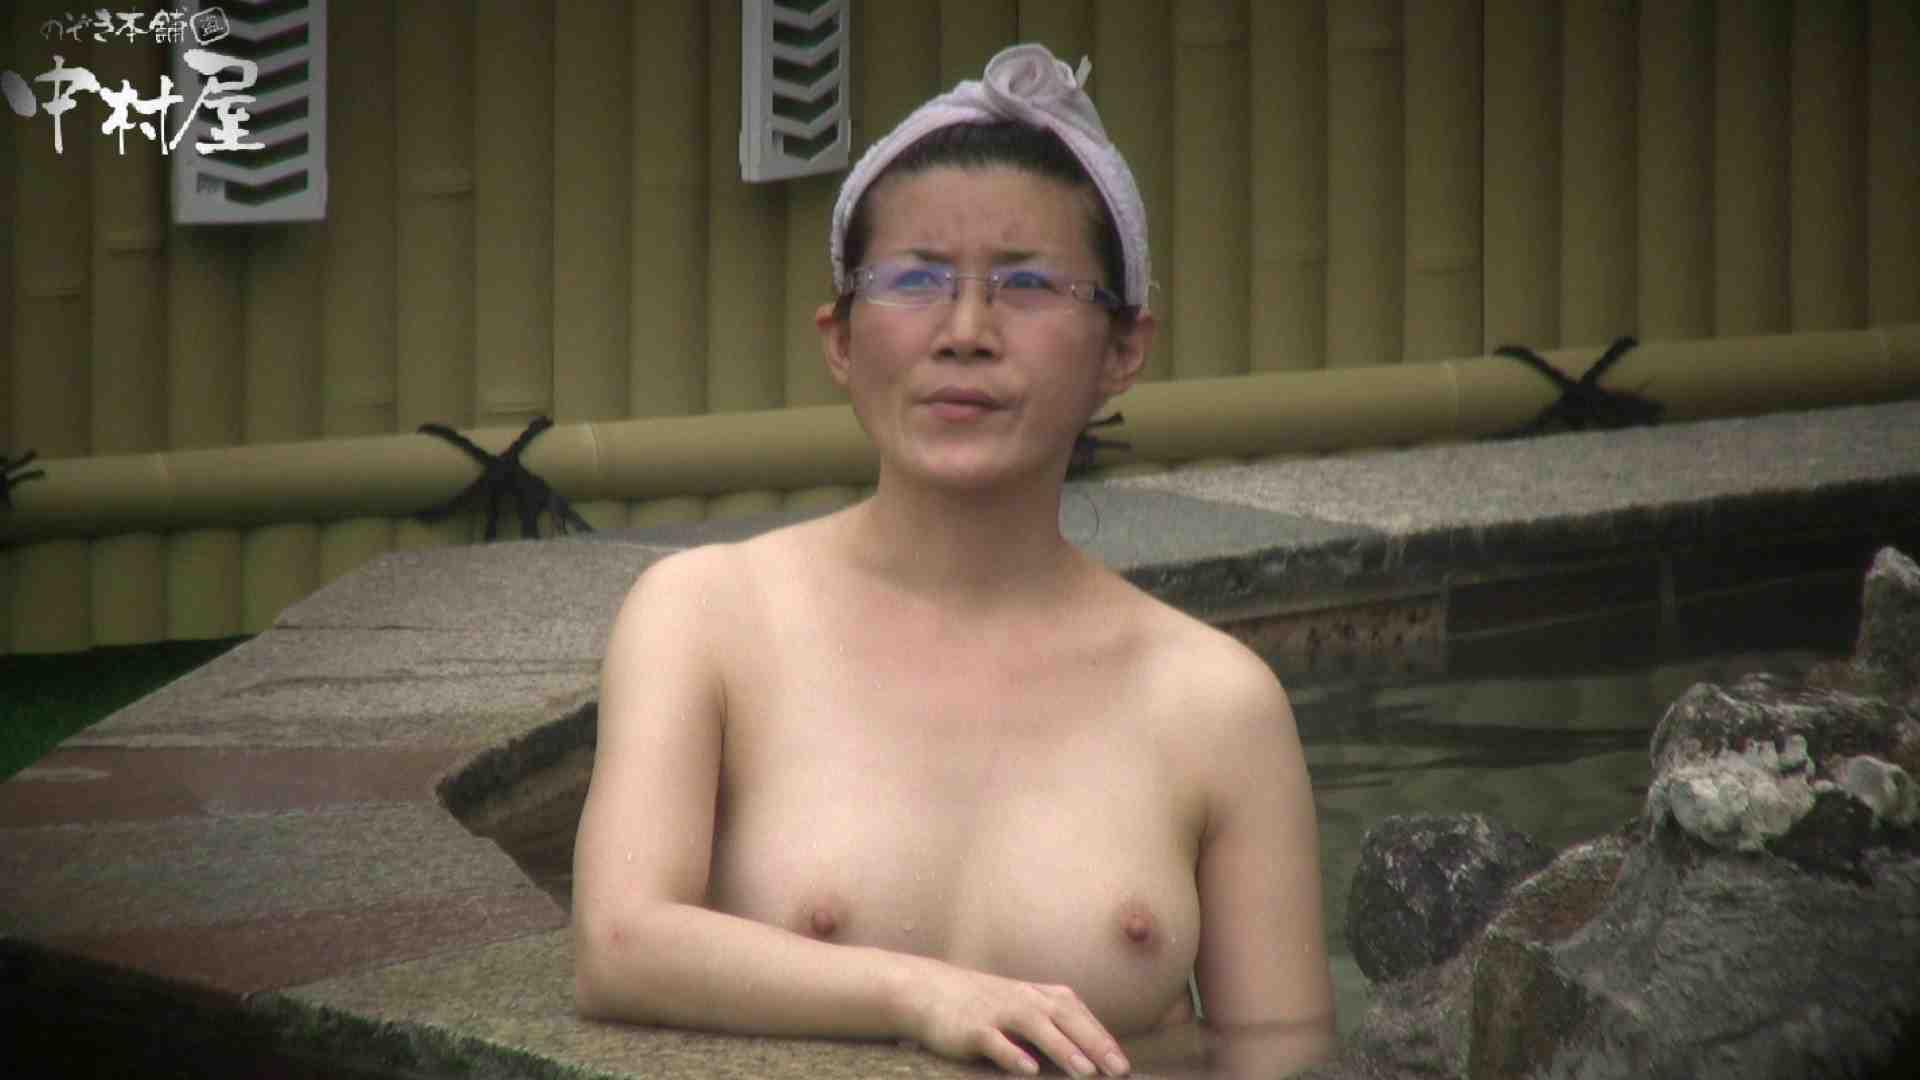 Aquaな露天風呂Vol.905 露天風呂   OLのエロ生活  99連発 97